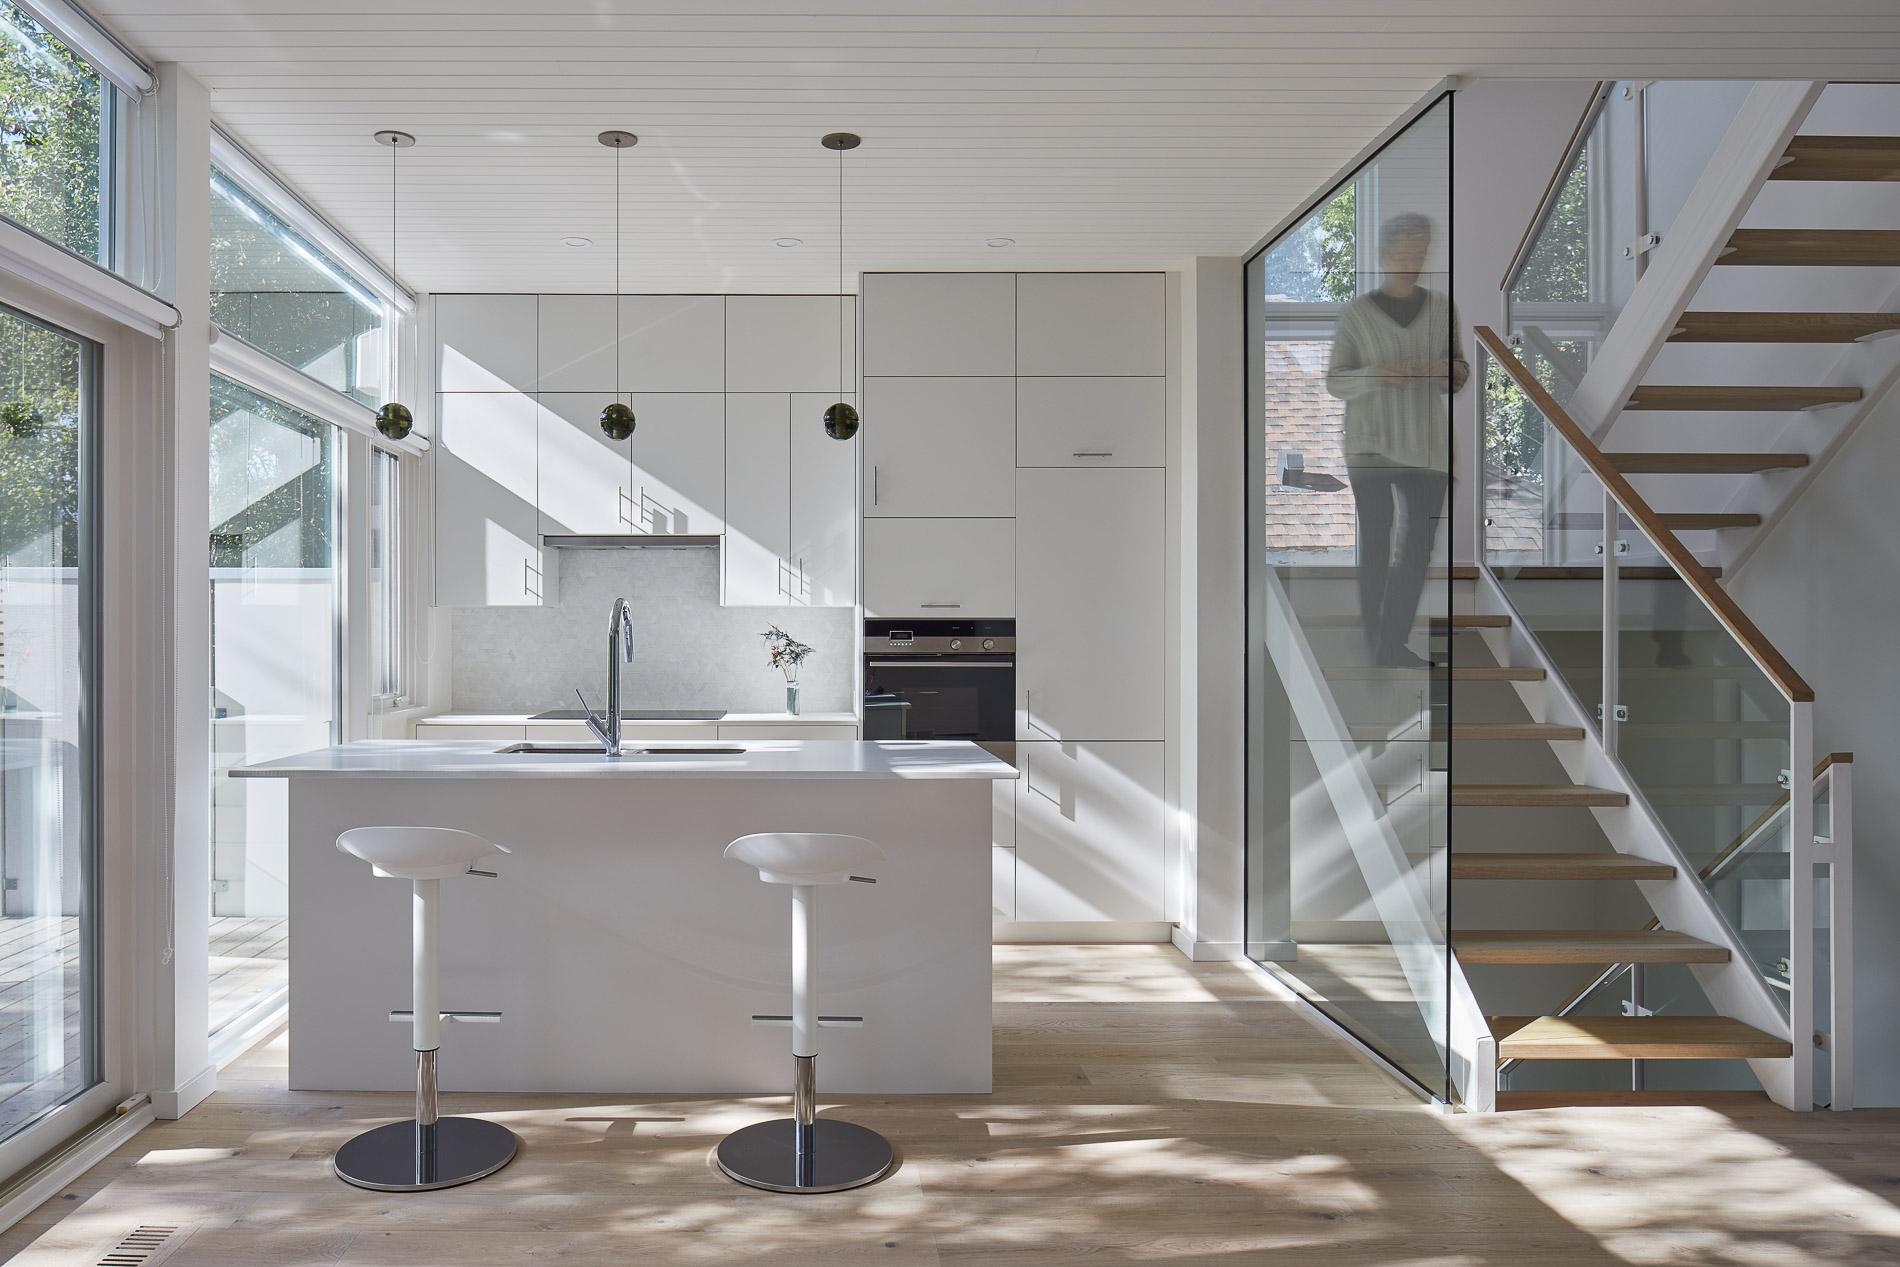 010-Shean Architects Fentiman.jpg